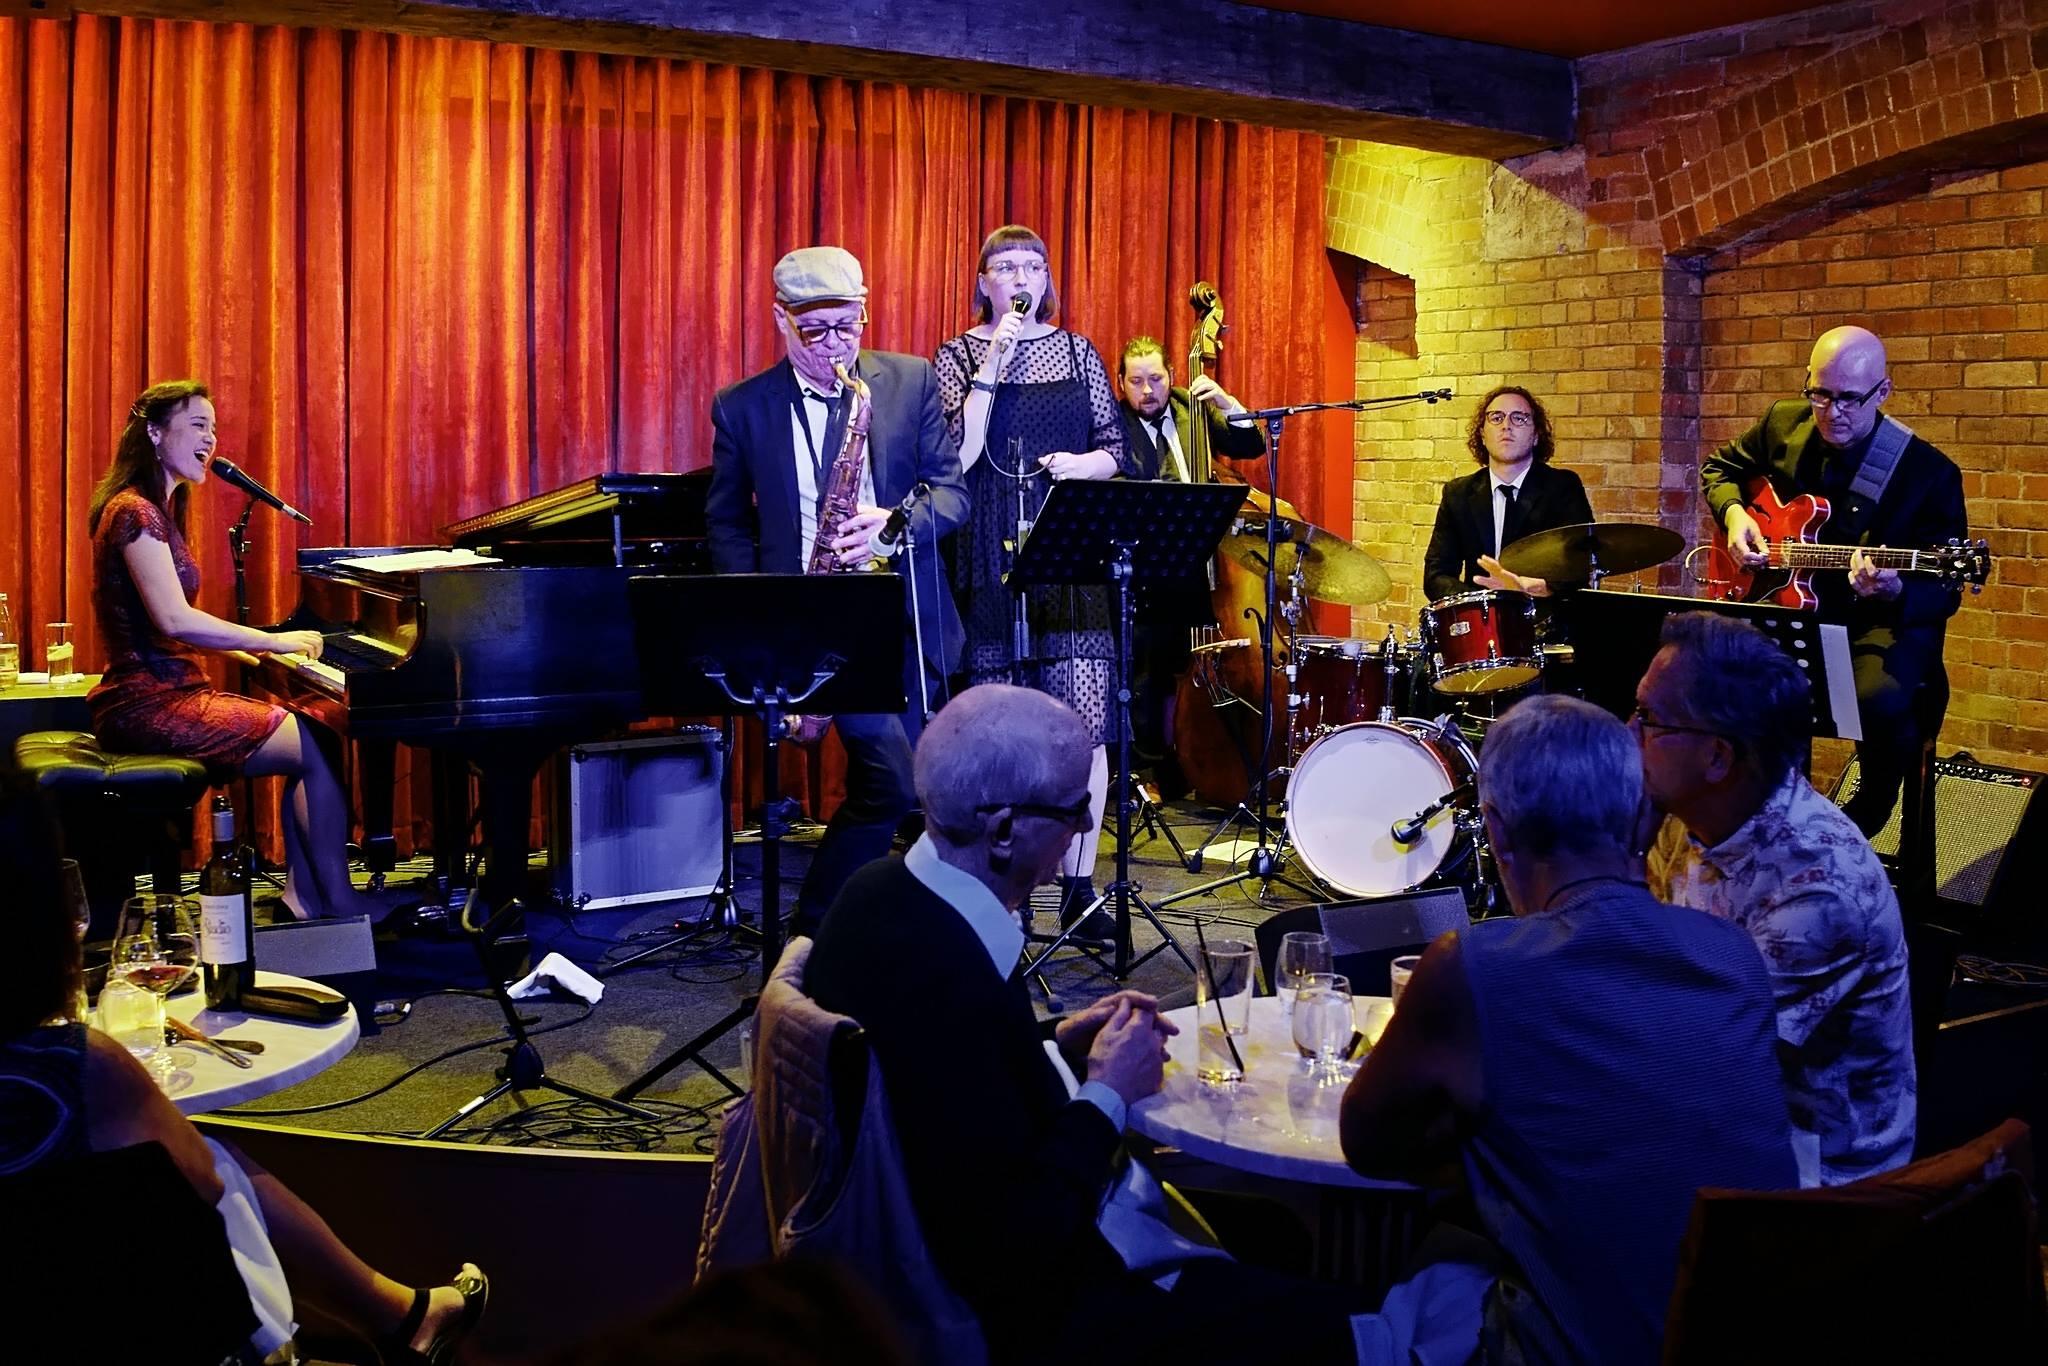 Doo-Bop Jazz Bar, Brisbane, Oct 2017